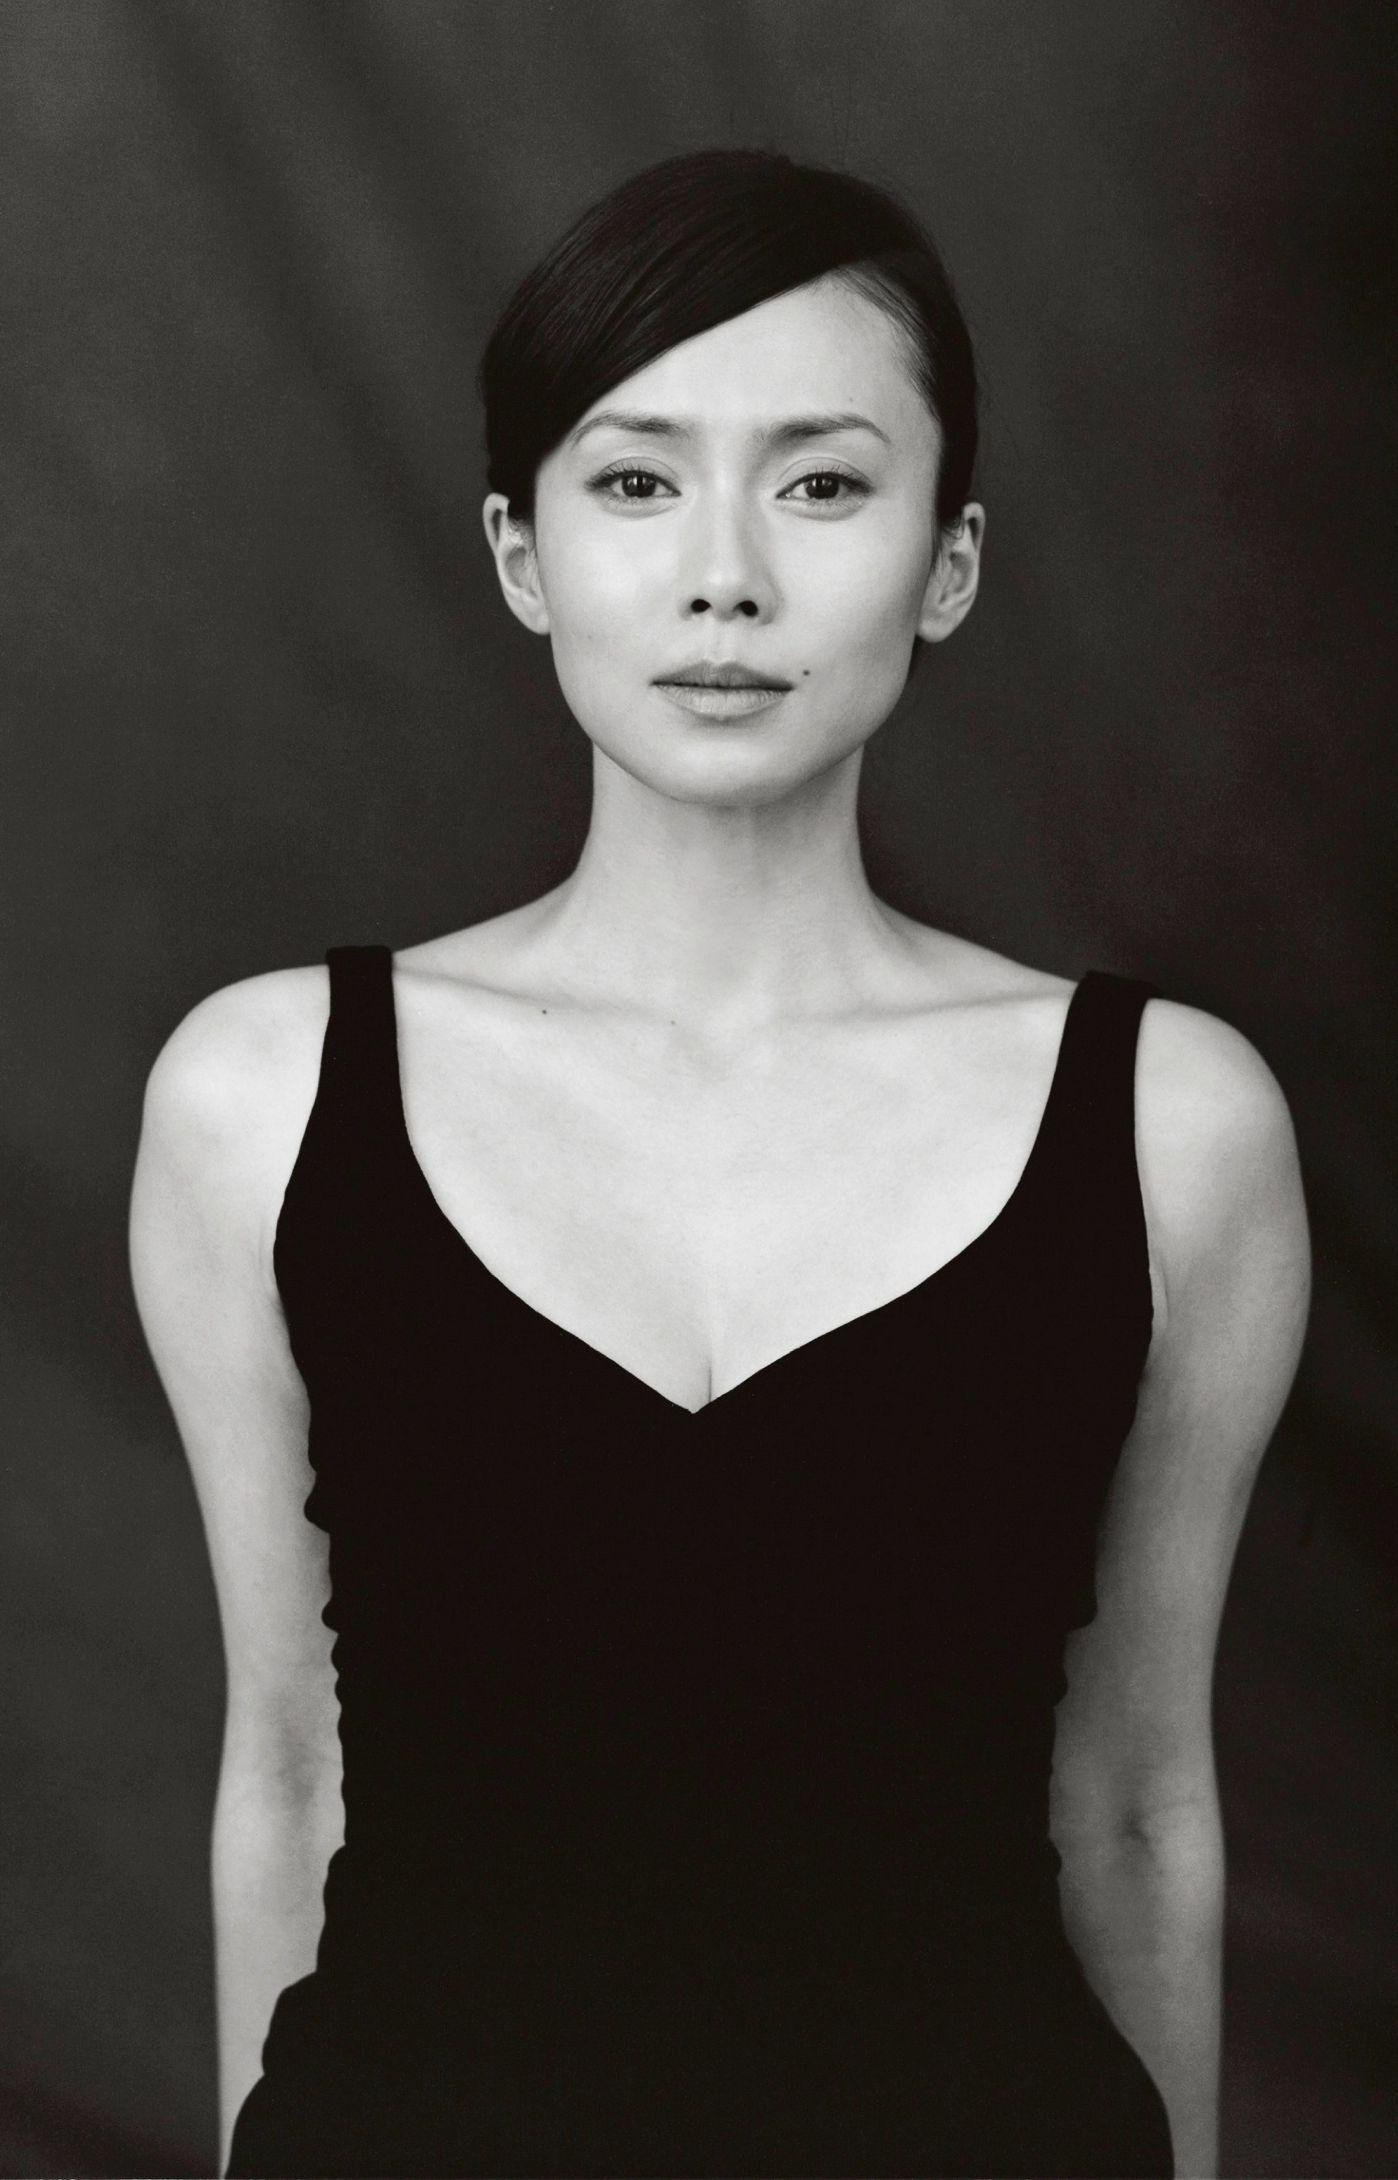 Forum on this topic: June Angela, miki-nakatani/